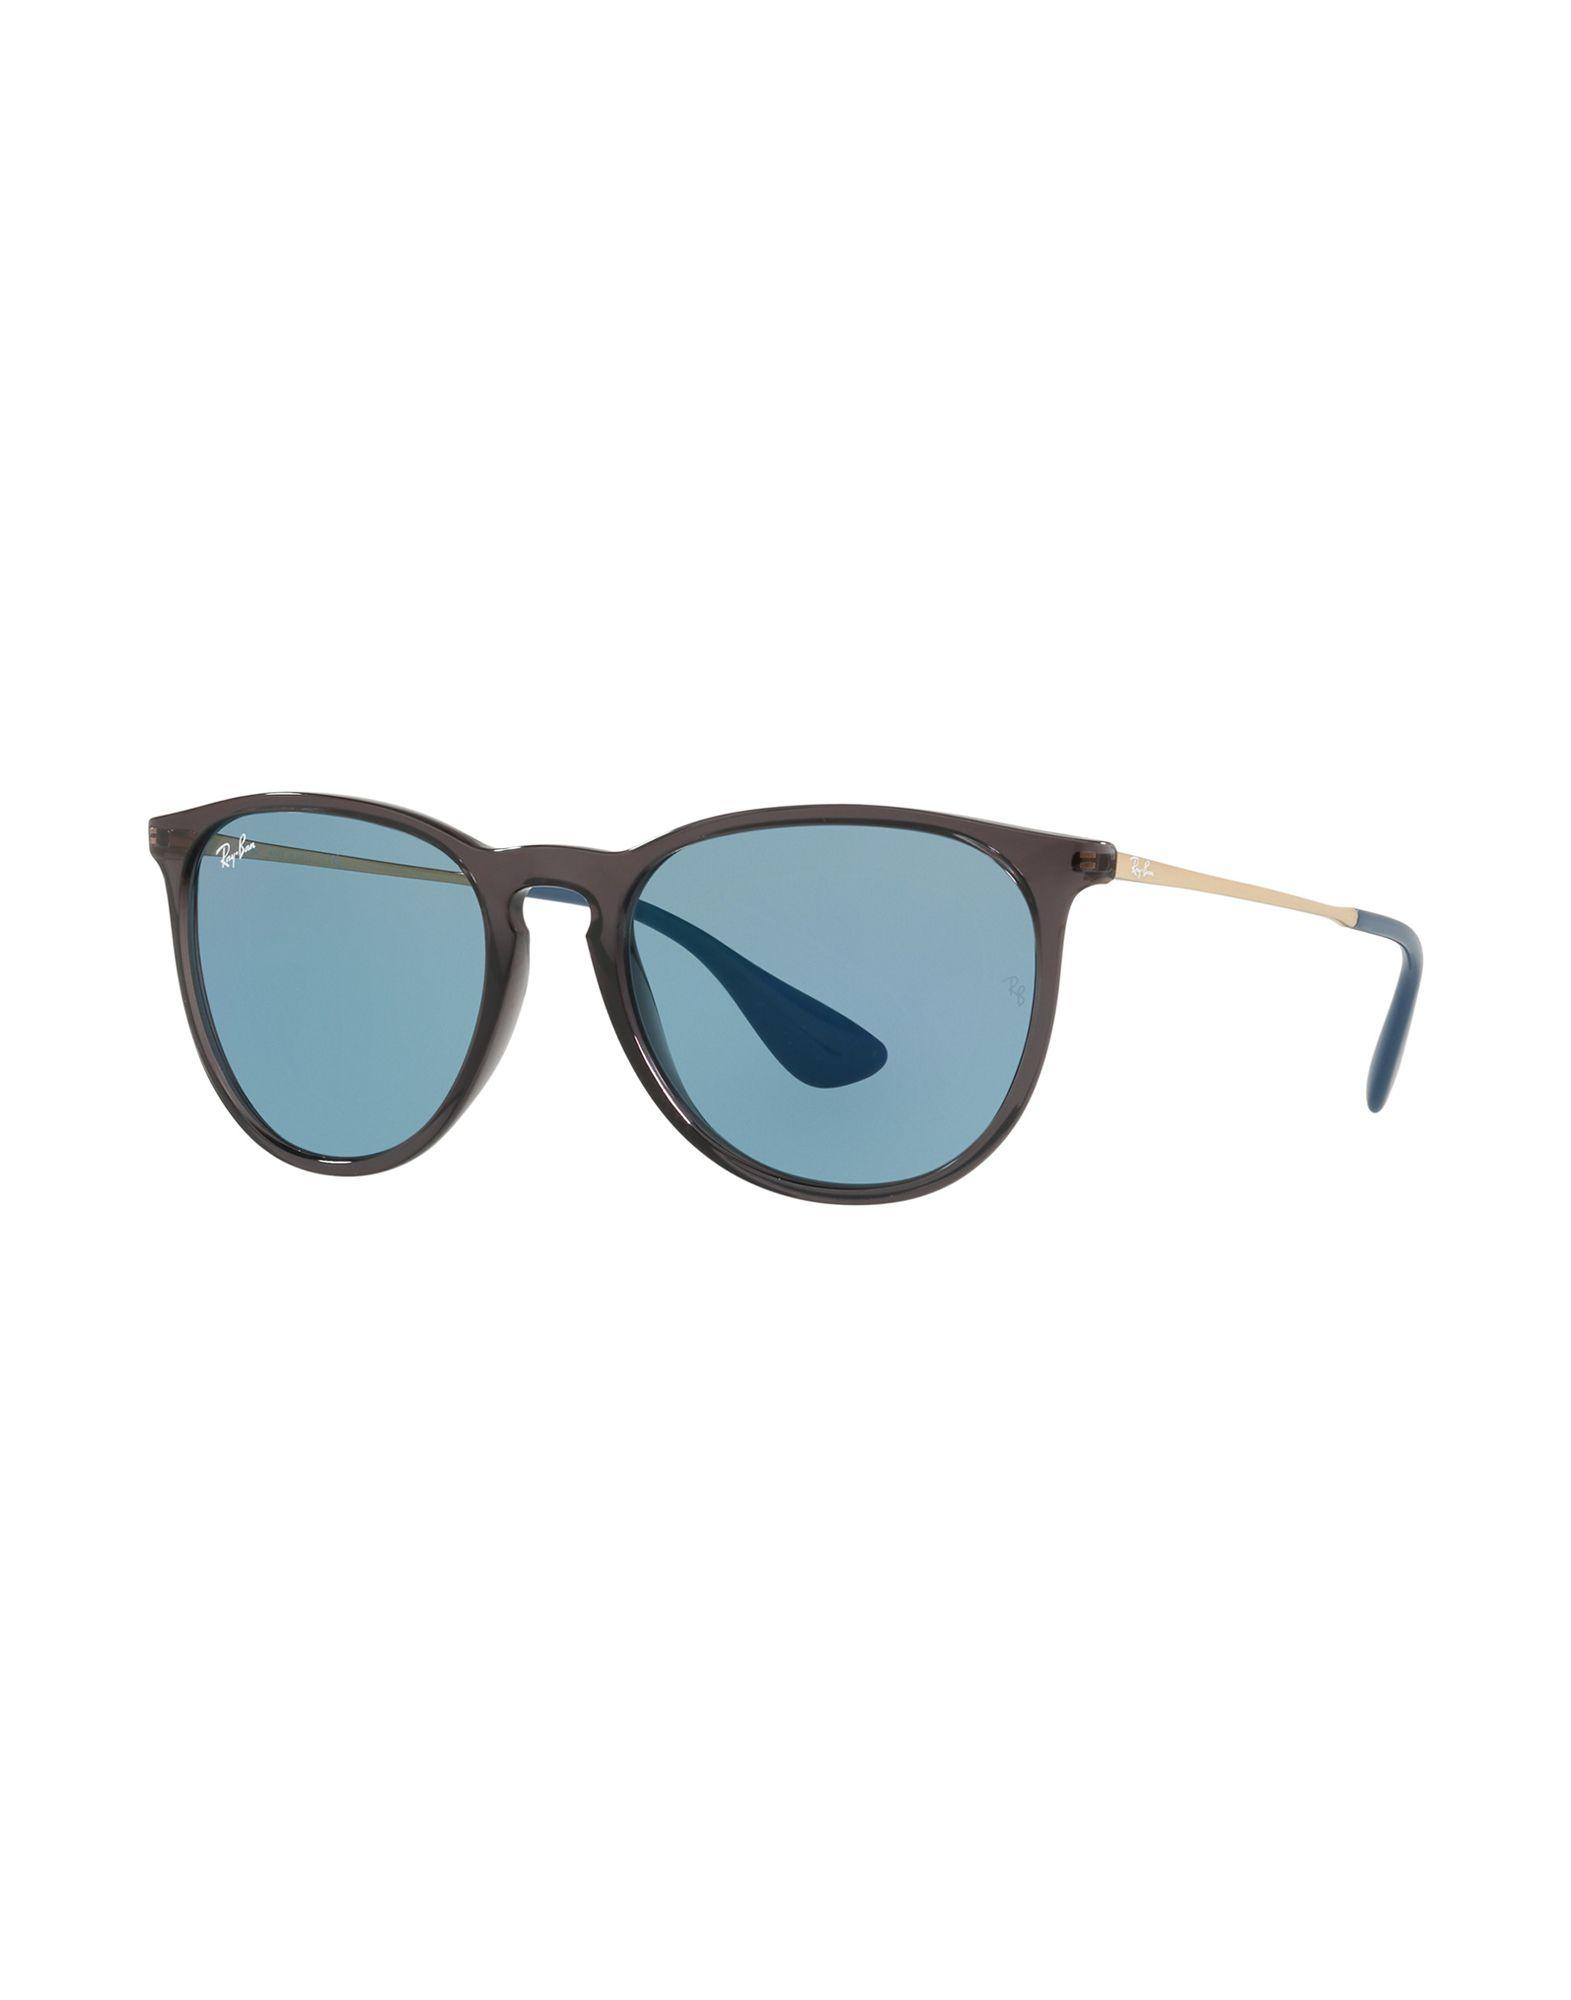 RAY-BAN Солнечные очки солнцезащитные очки ray ban rayban rb3025jm 001 002 146 32